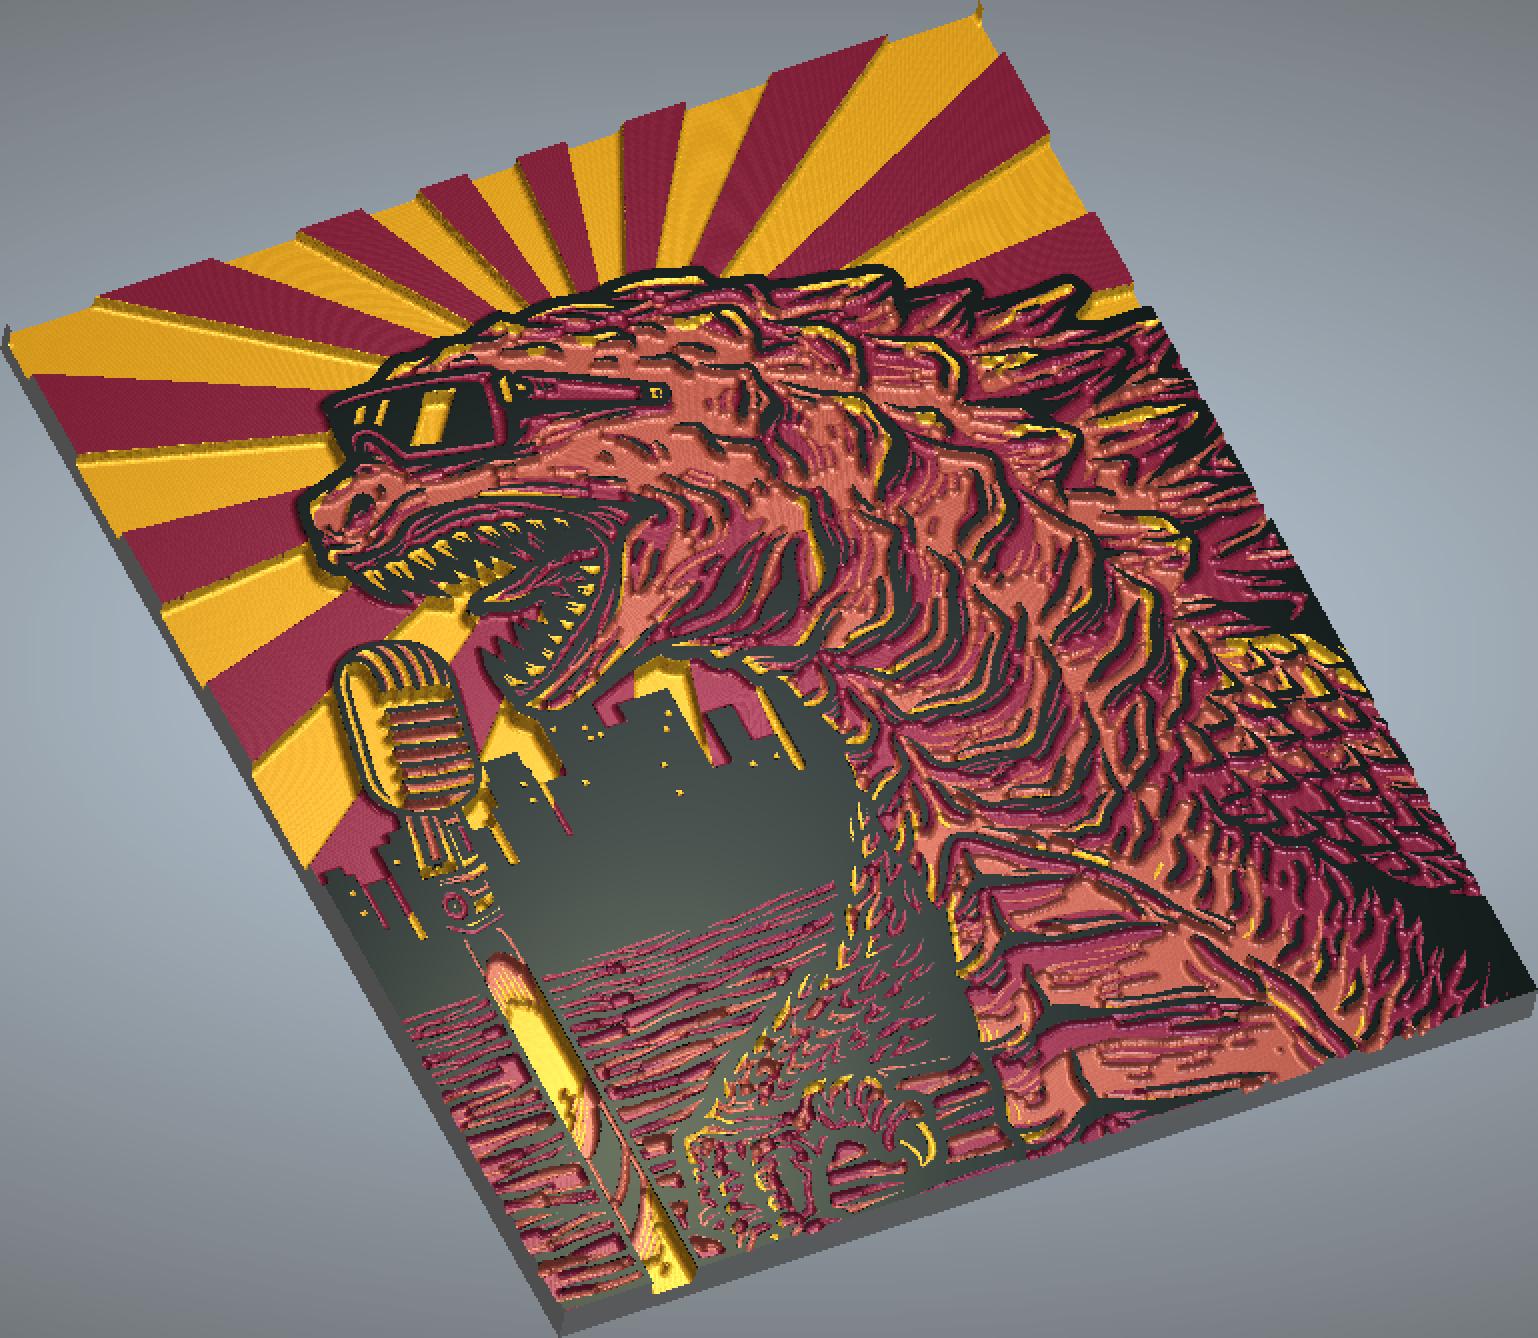 Godzilla Monster of Rock